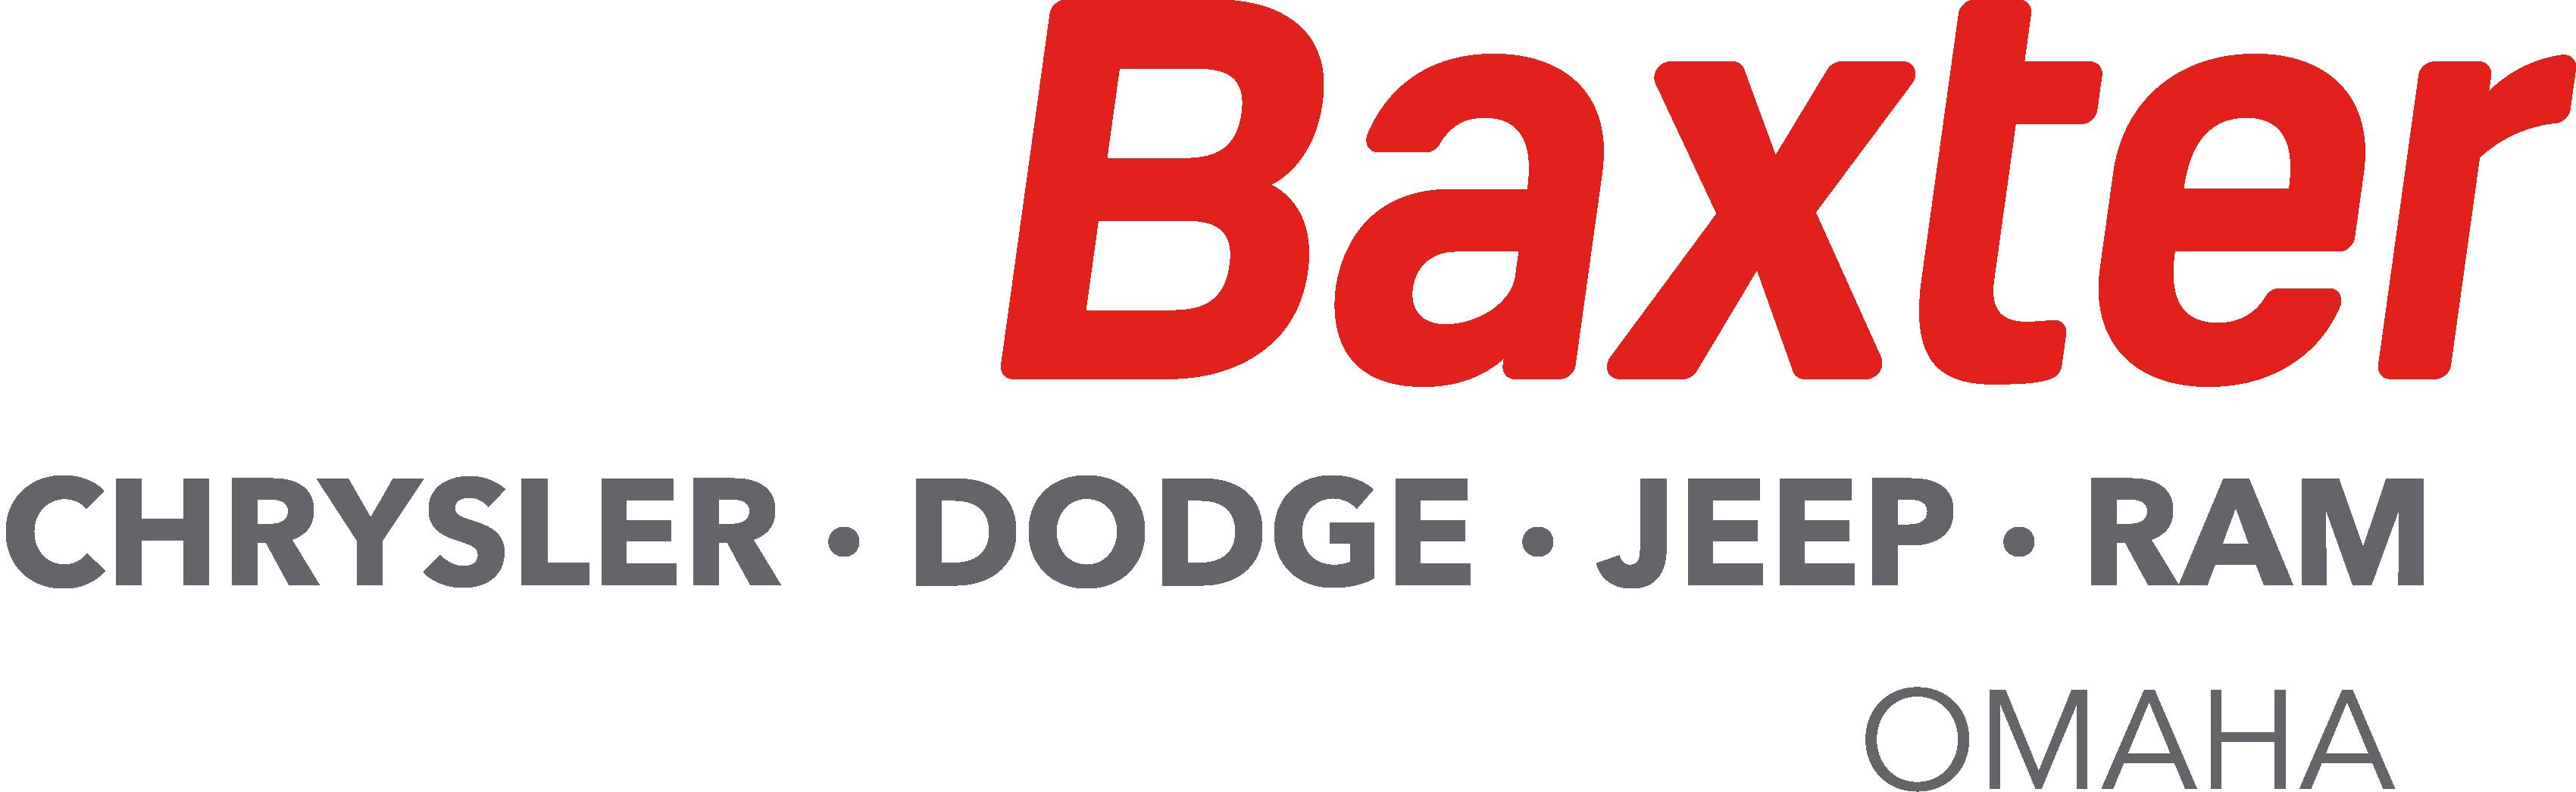 Baxter Auto Omaha >> Baxter Chrysler Dodge Jeep Ram Jeep Sales Service In Omaha Ne